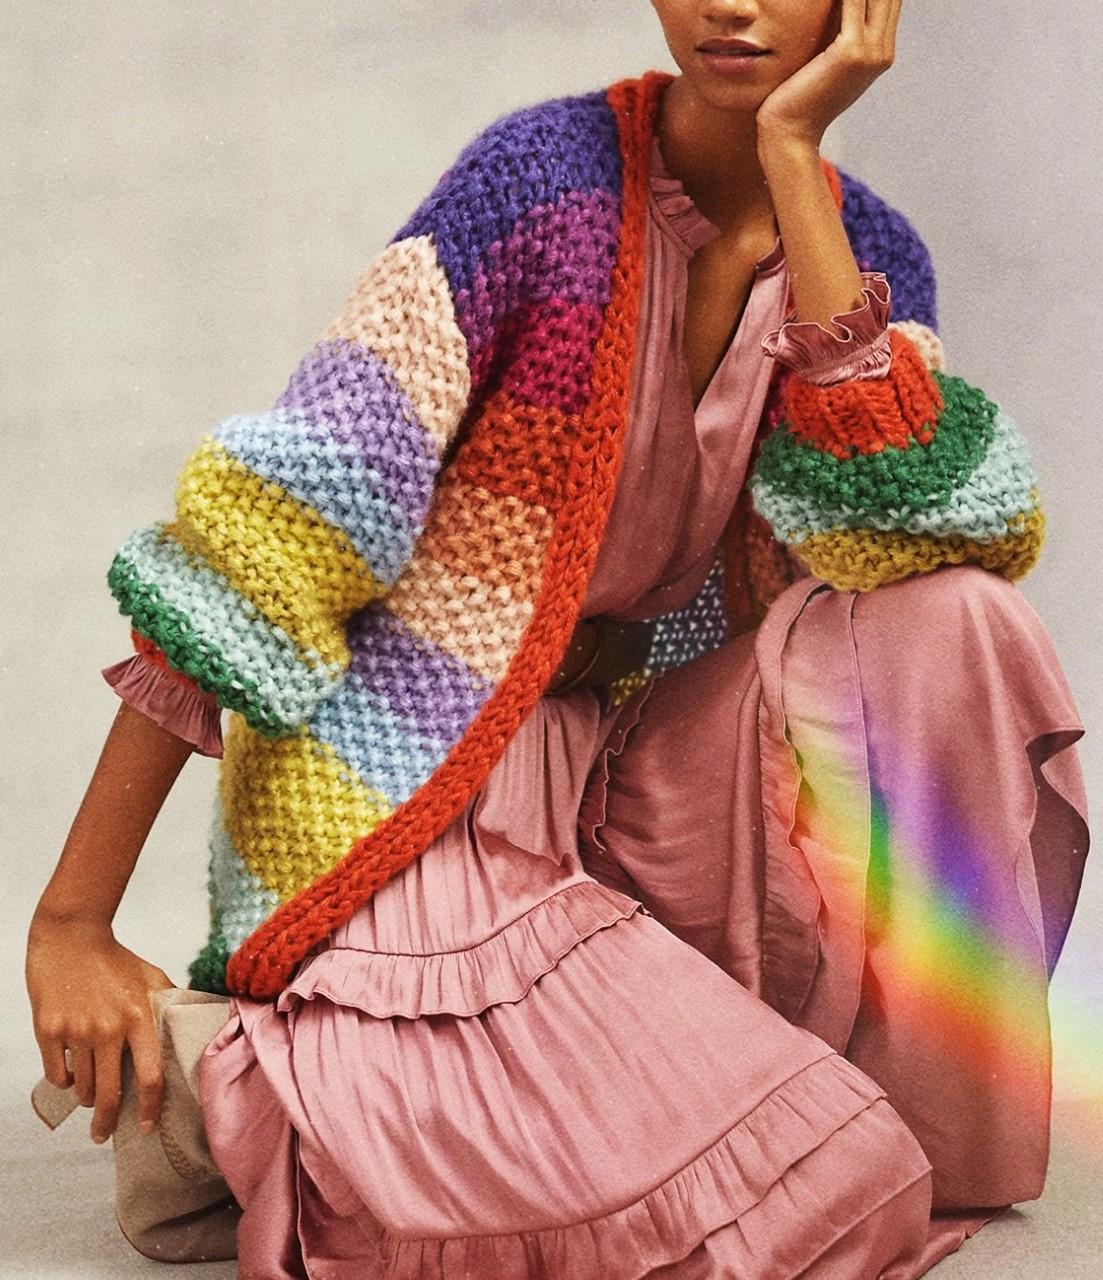 anthropologie Rainbow cardigan